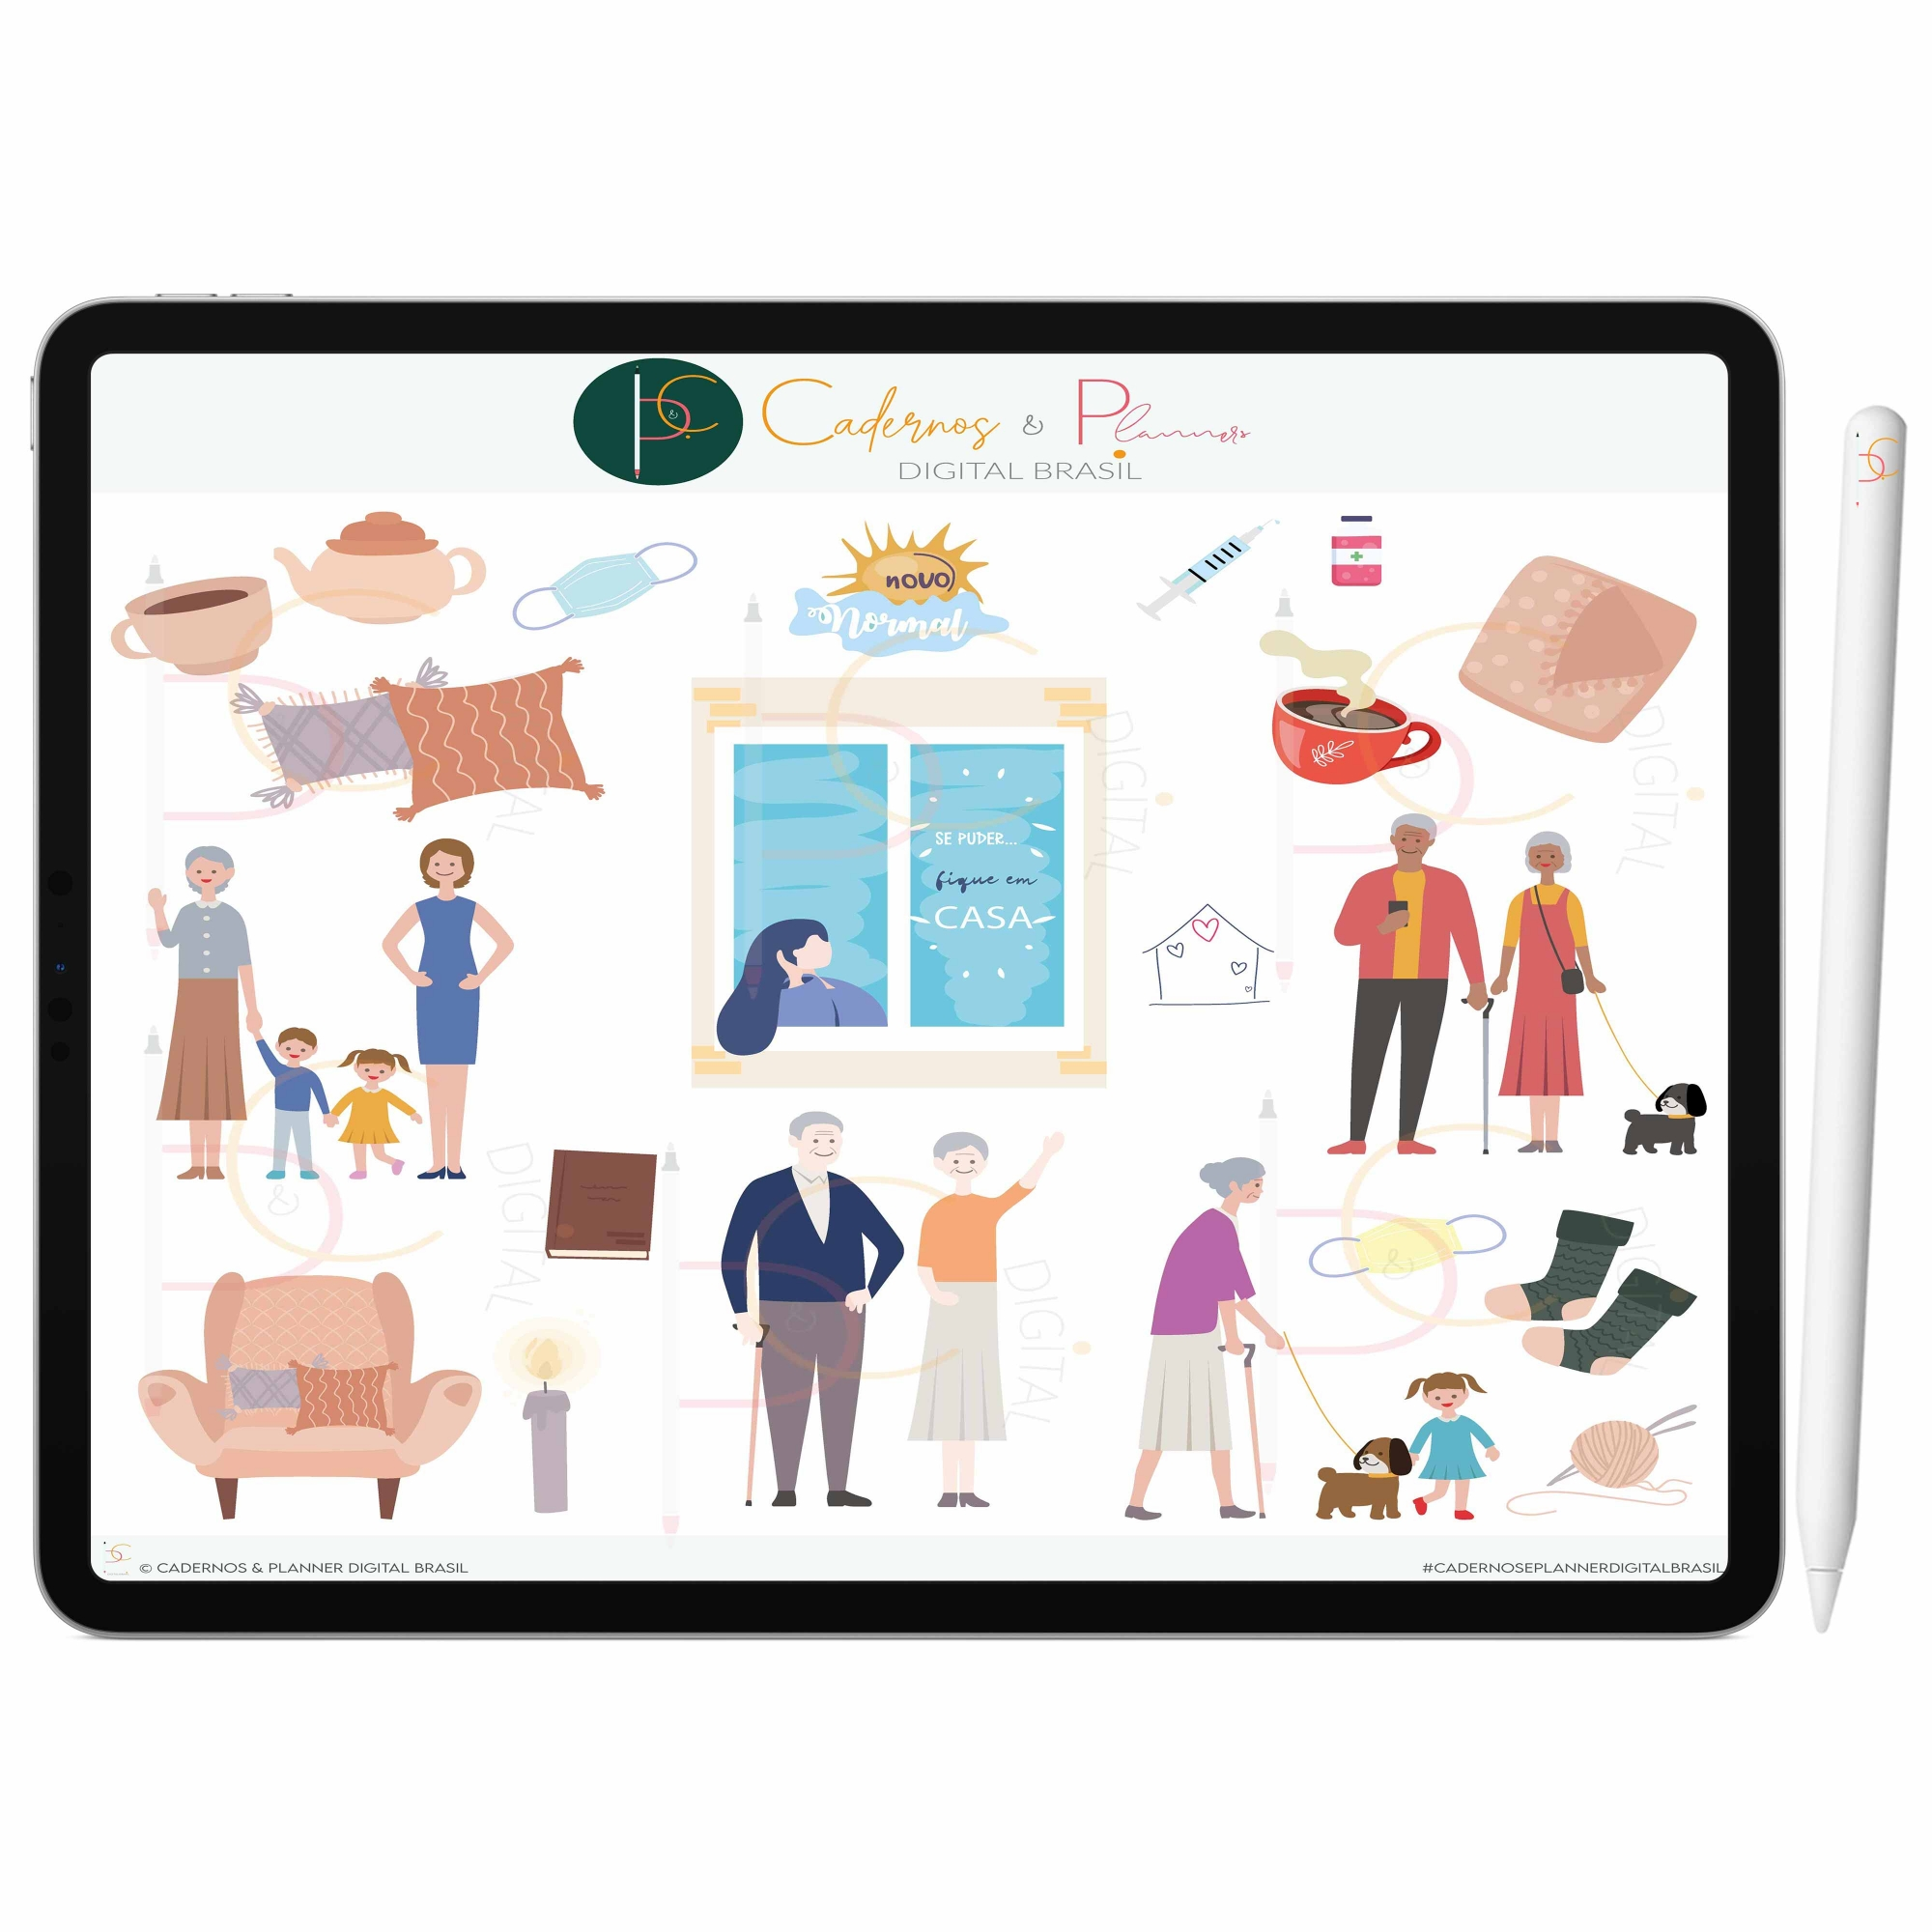 Adesivos Digital Fique Em Casa ' Cuide-se | Planner Digital, Caderno Digital | iPad ' Tablet | GoodNotes ' Noteshelf ' Notability